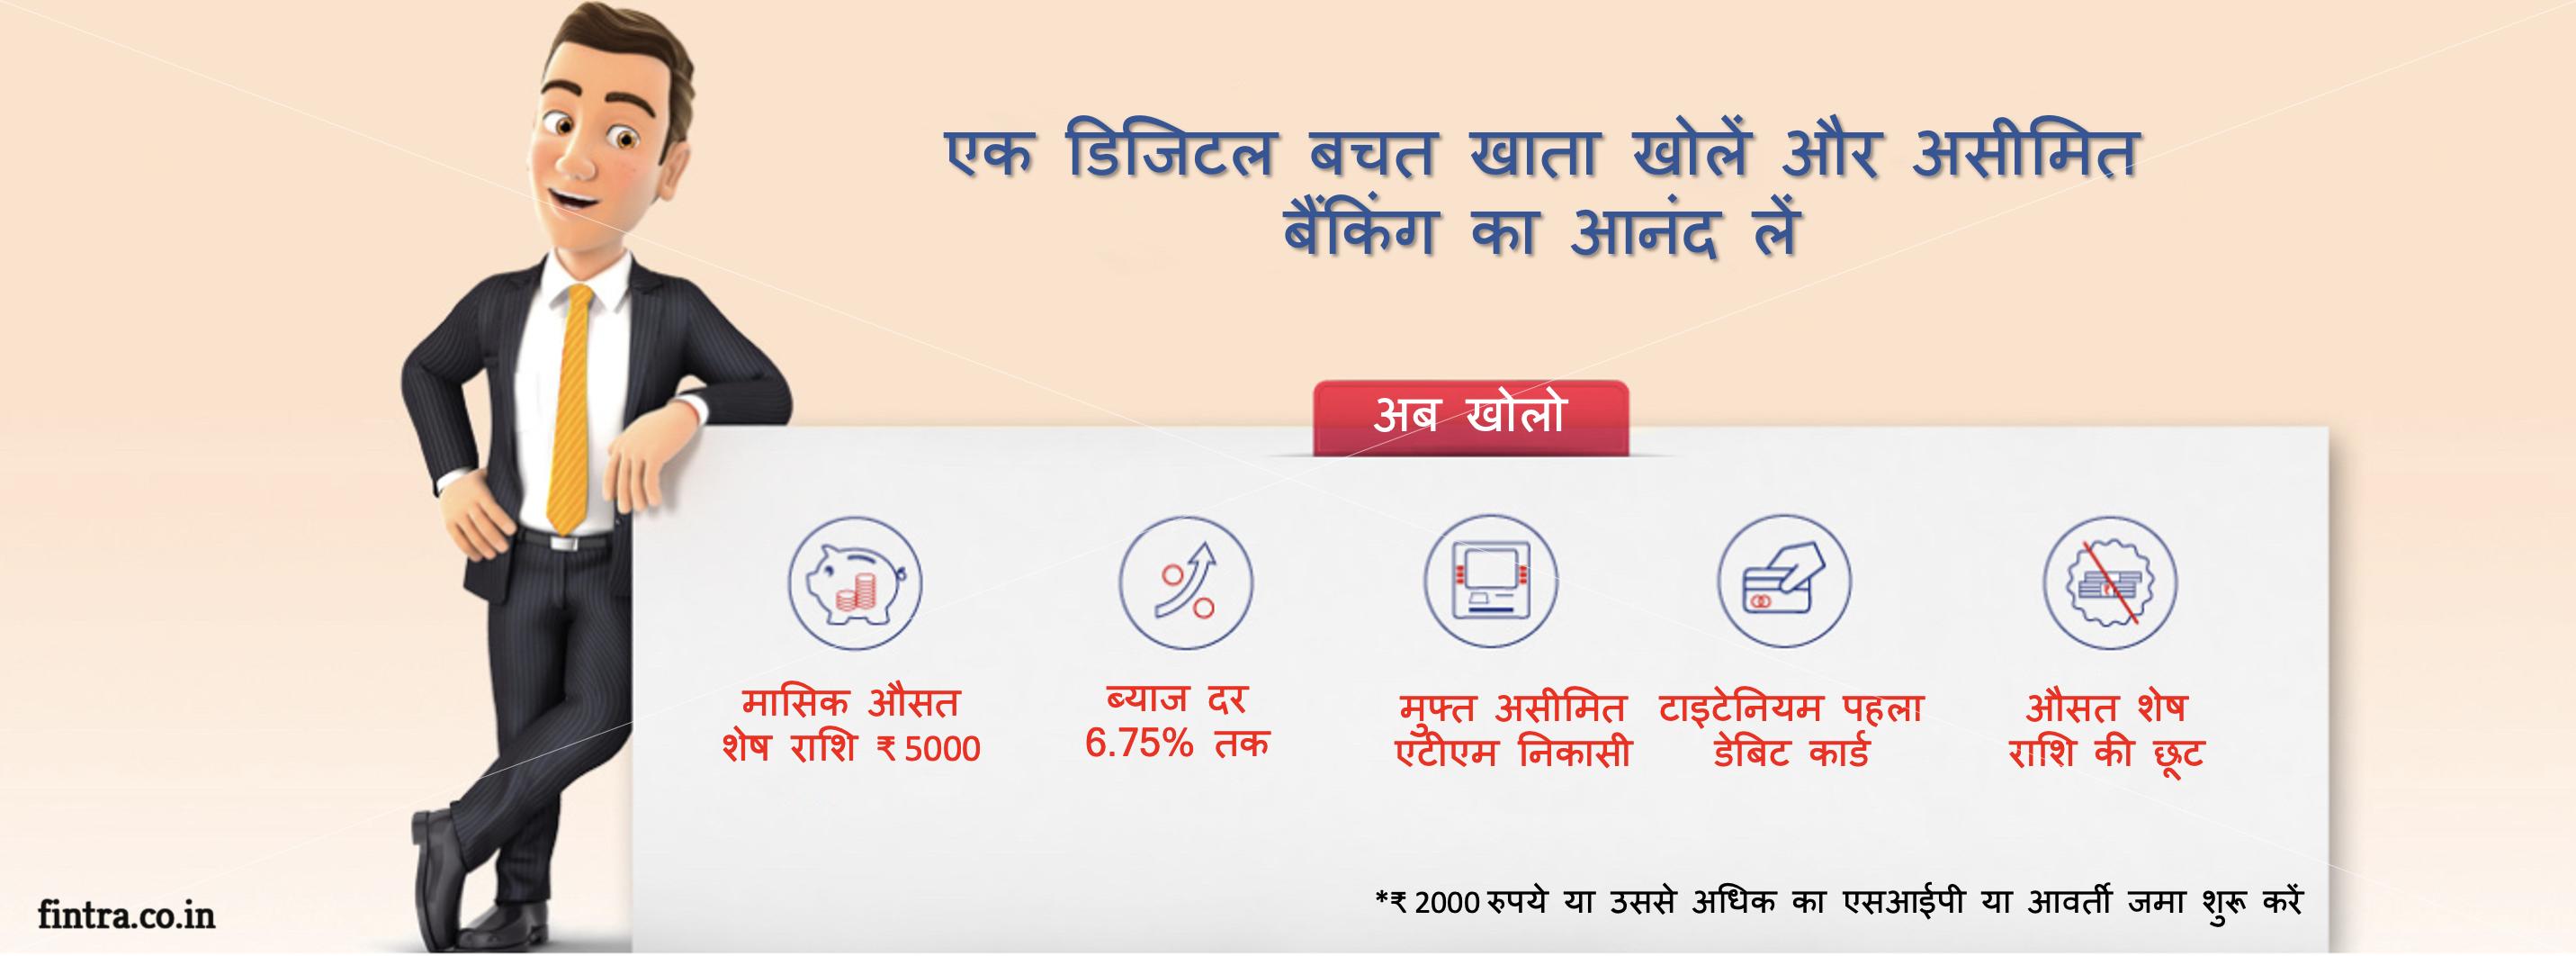 rbl bank digital savings account